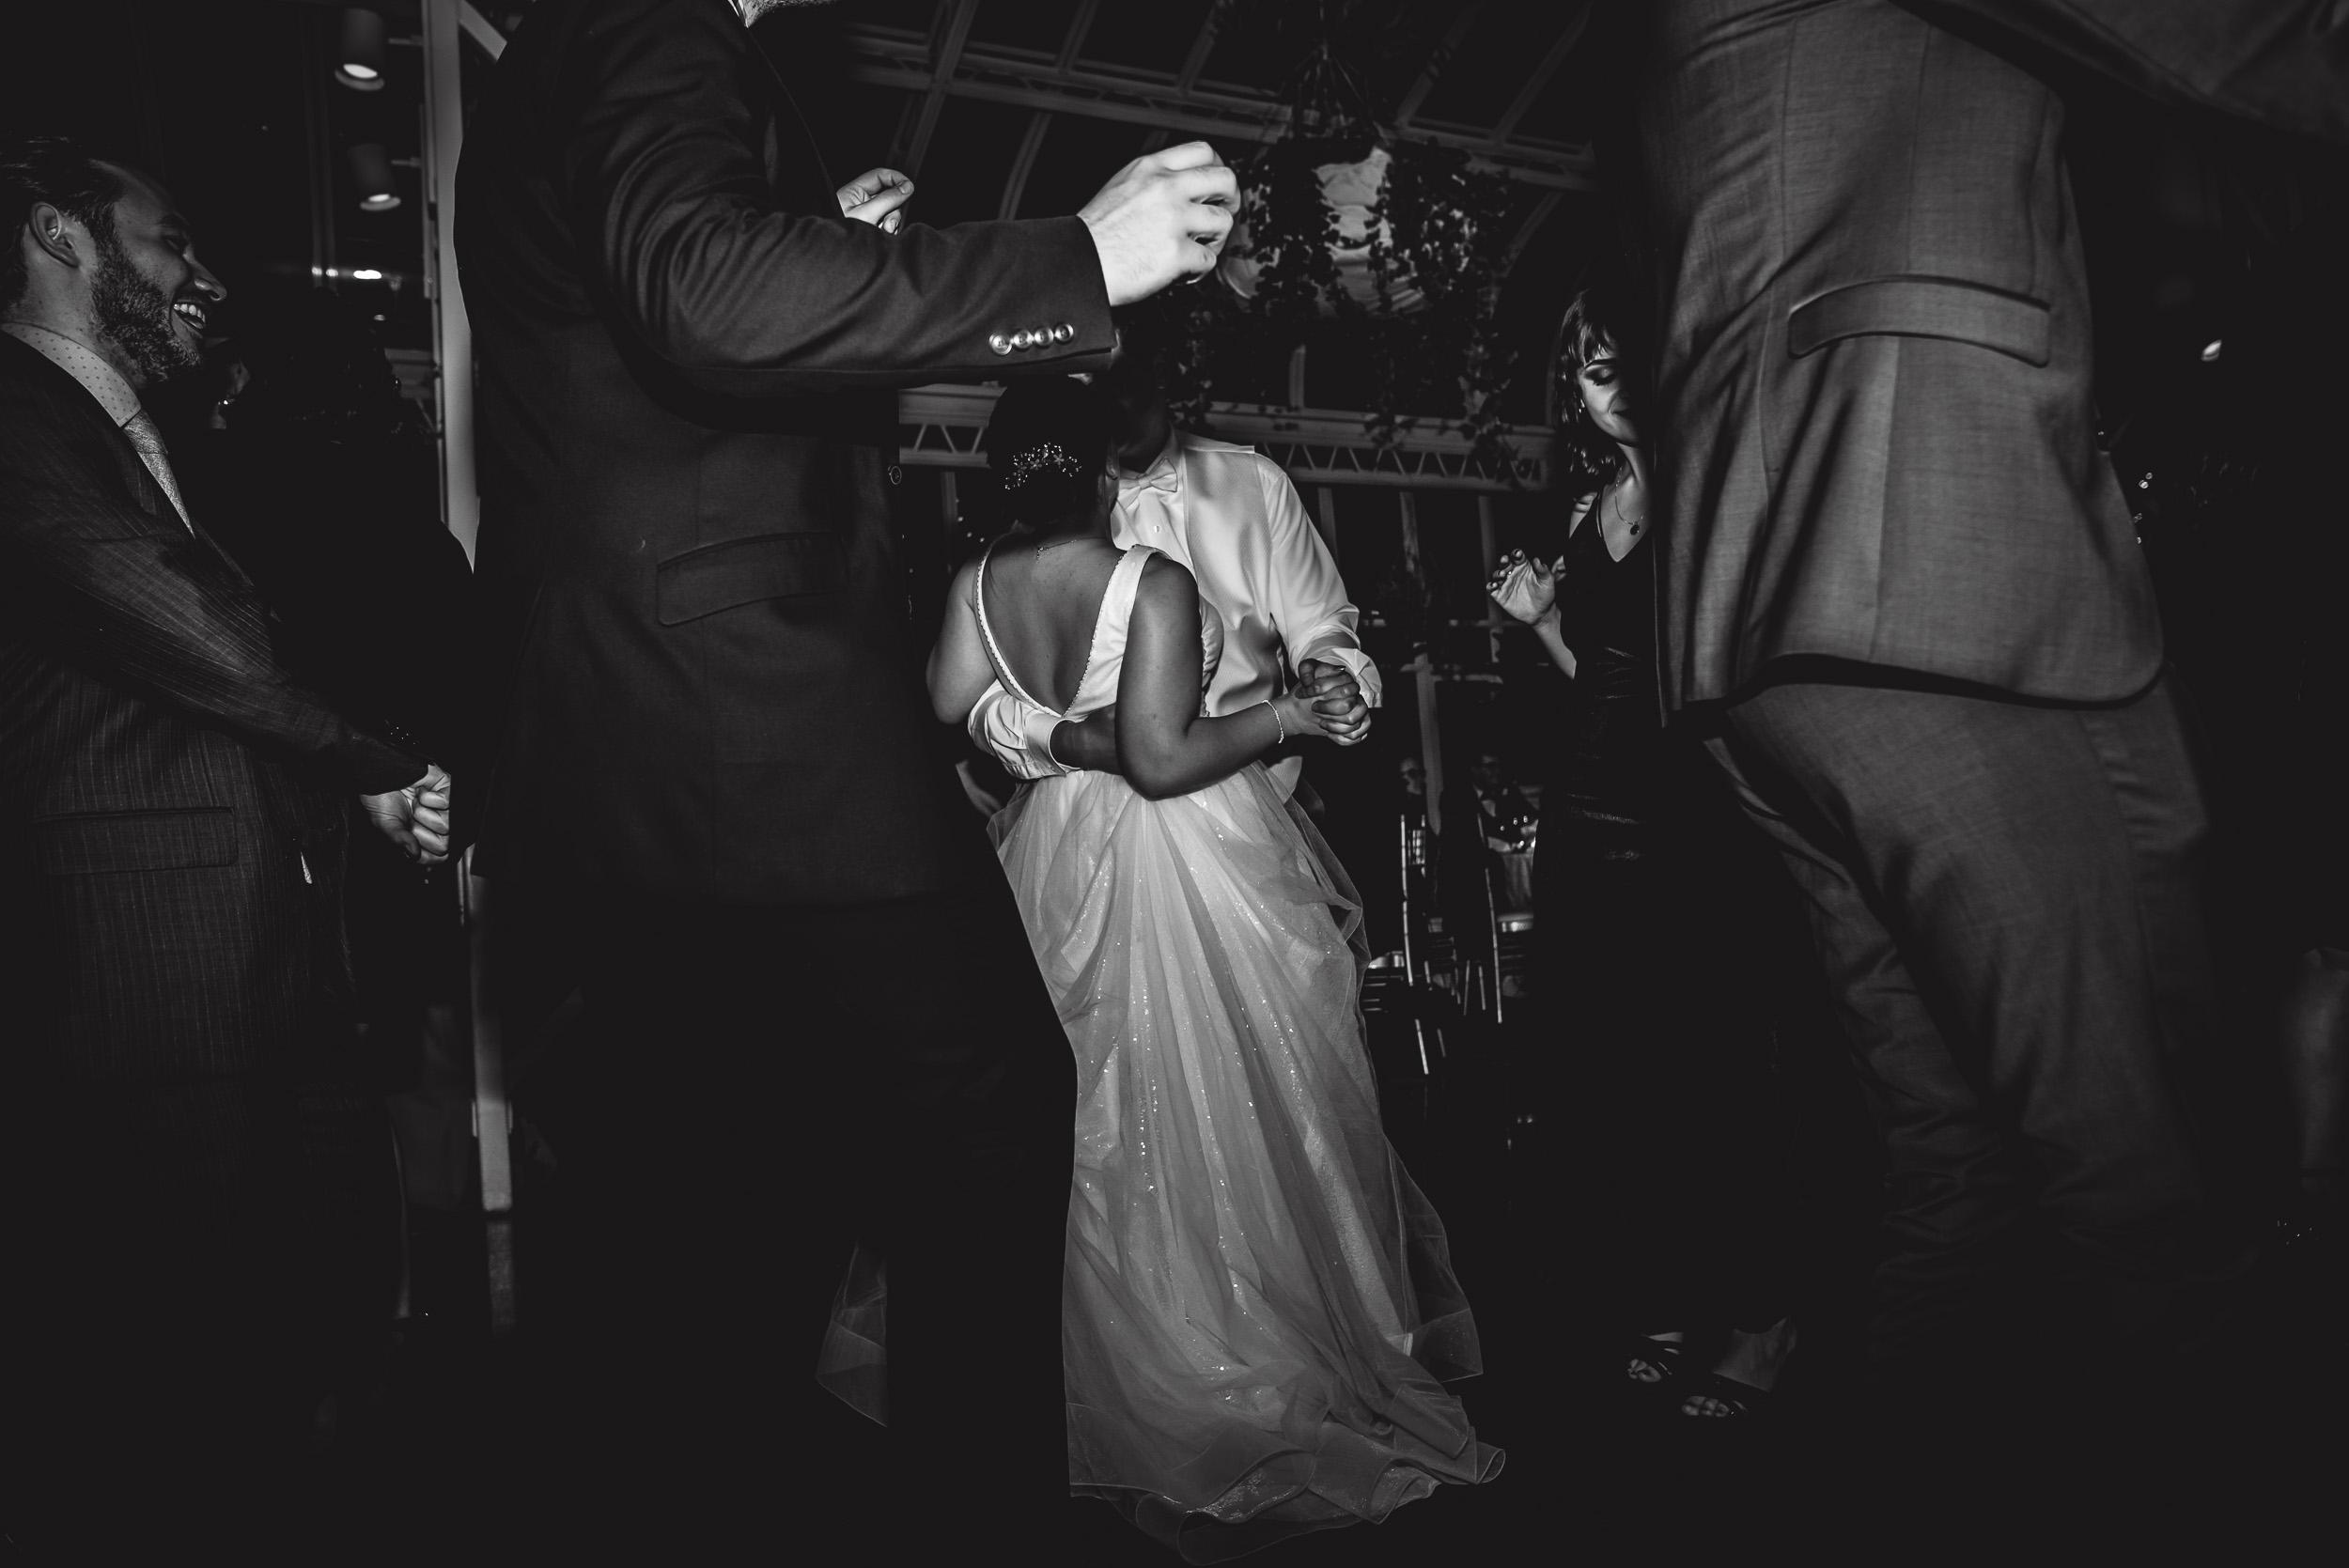 KatieandMathias_Morristown_NewJersey_Wedding_Church_Assumption_Madison_Hotel(48of65).jpg